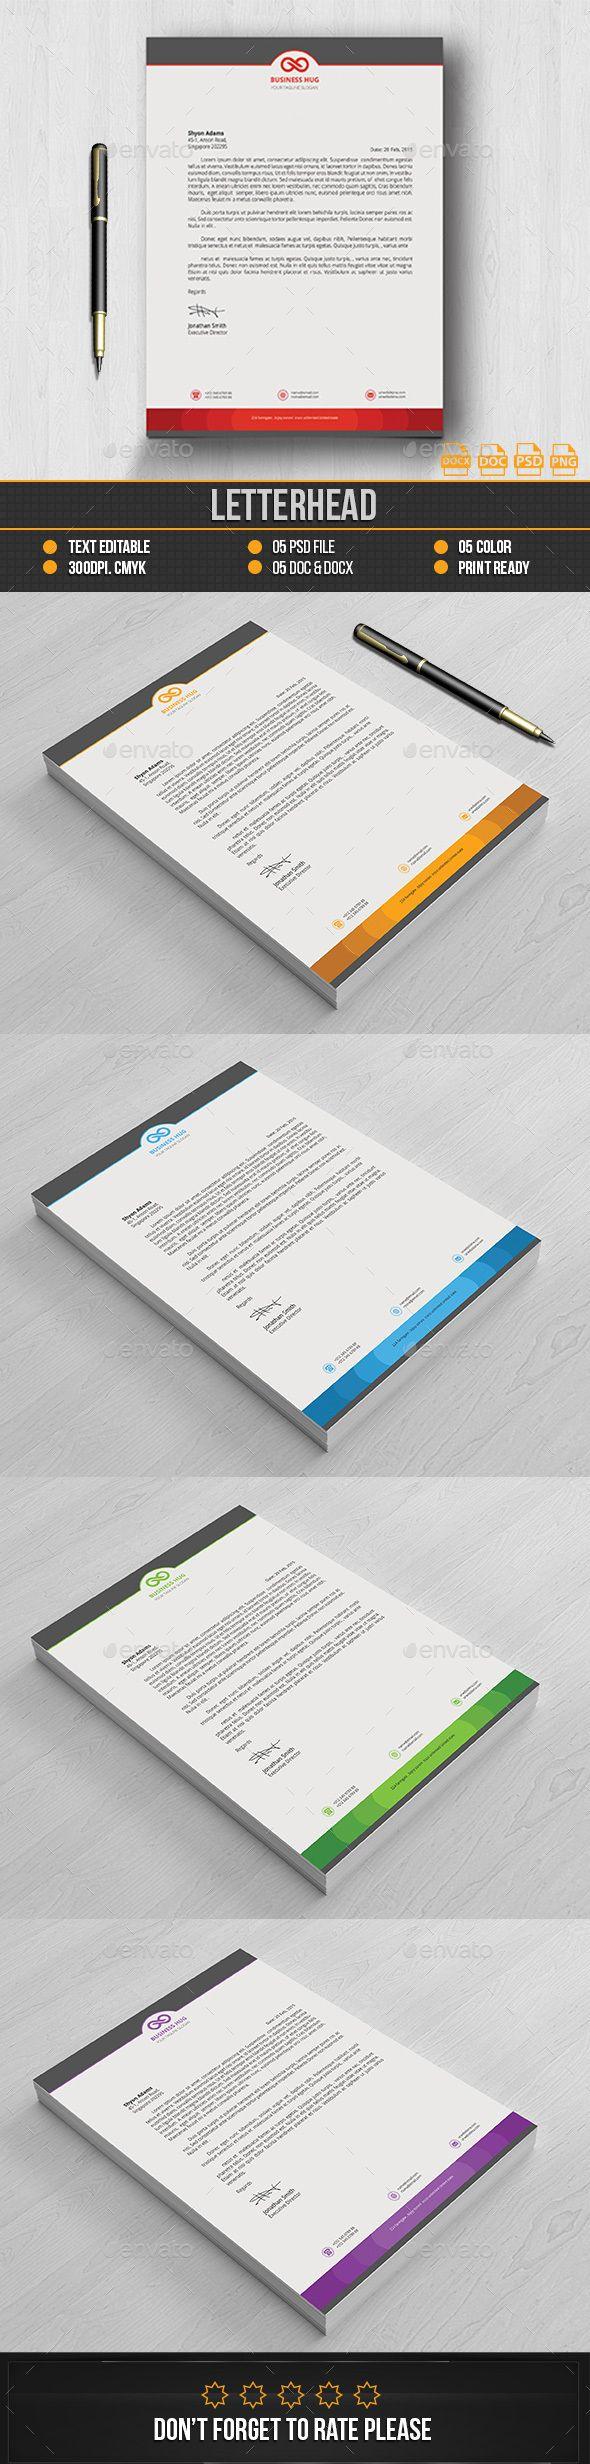 Letterhead Design Template PSD, MS Word